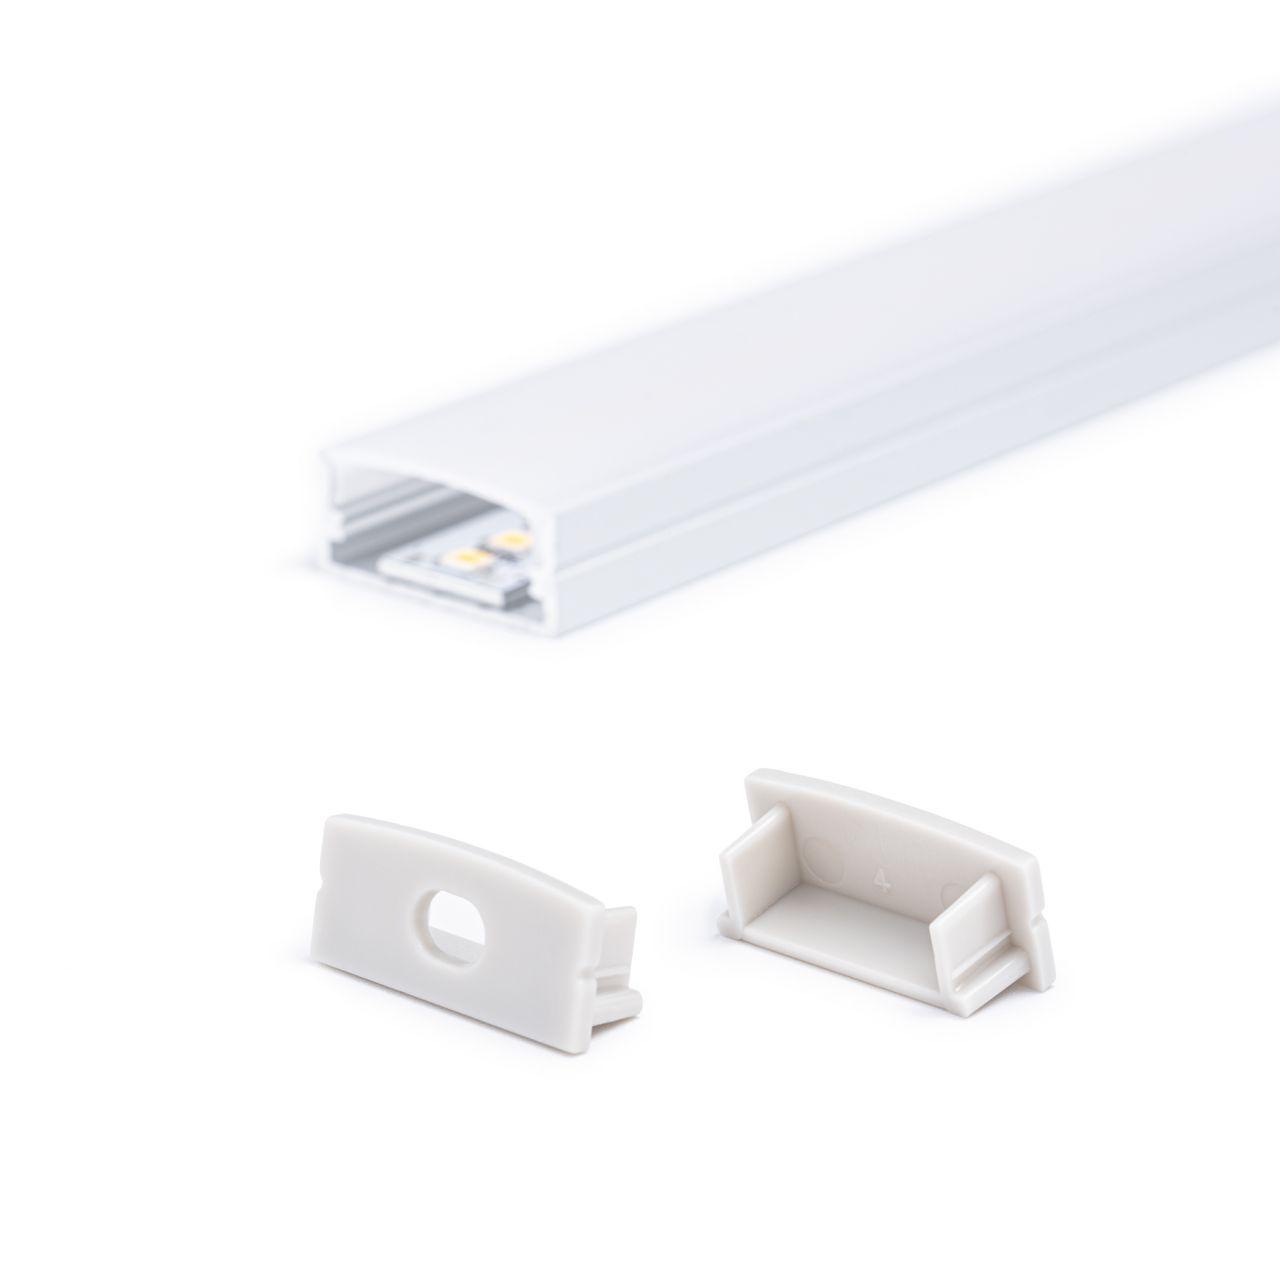 Endkappe für Aluminium LED Profil CC-32